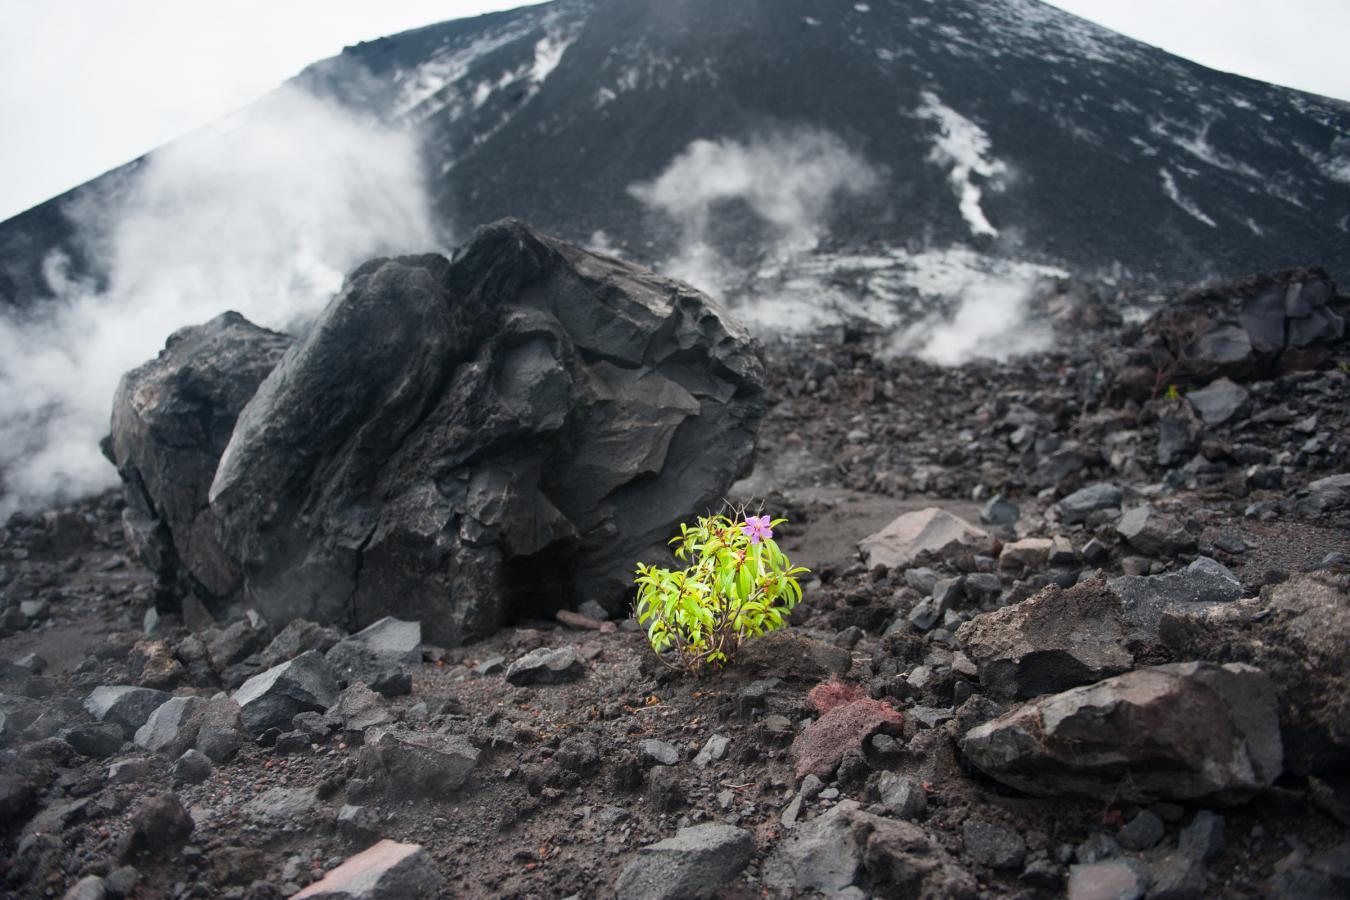 life-at-the-foot-of-a-volcano-java-2010